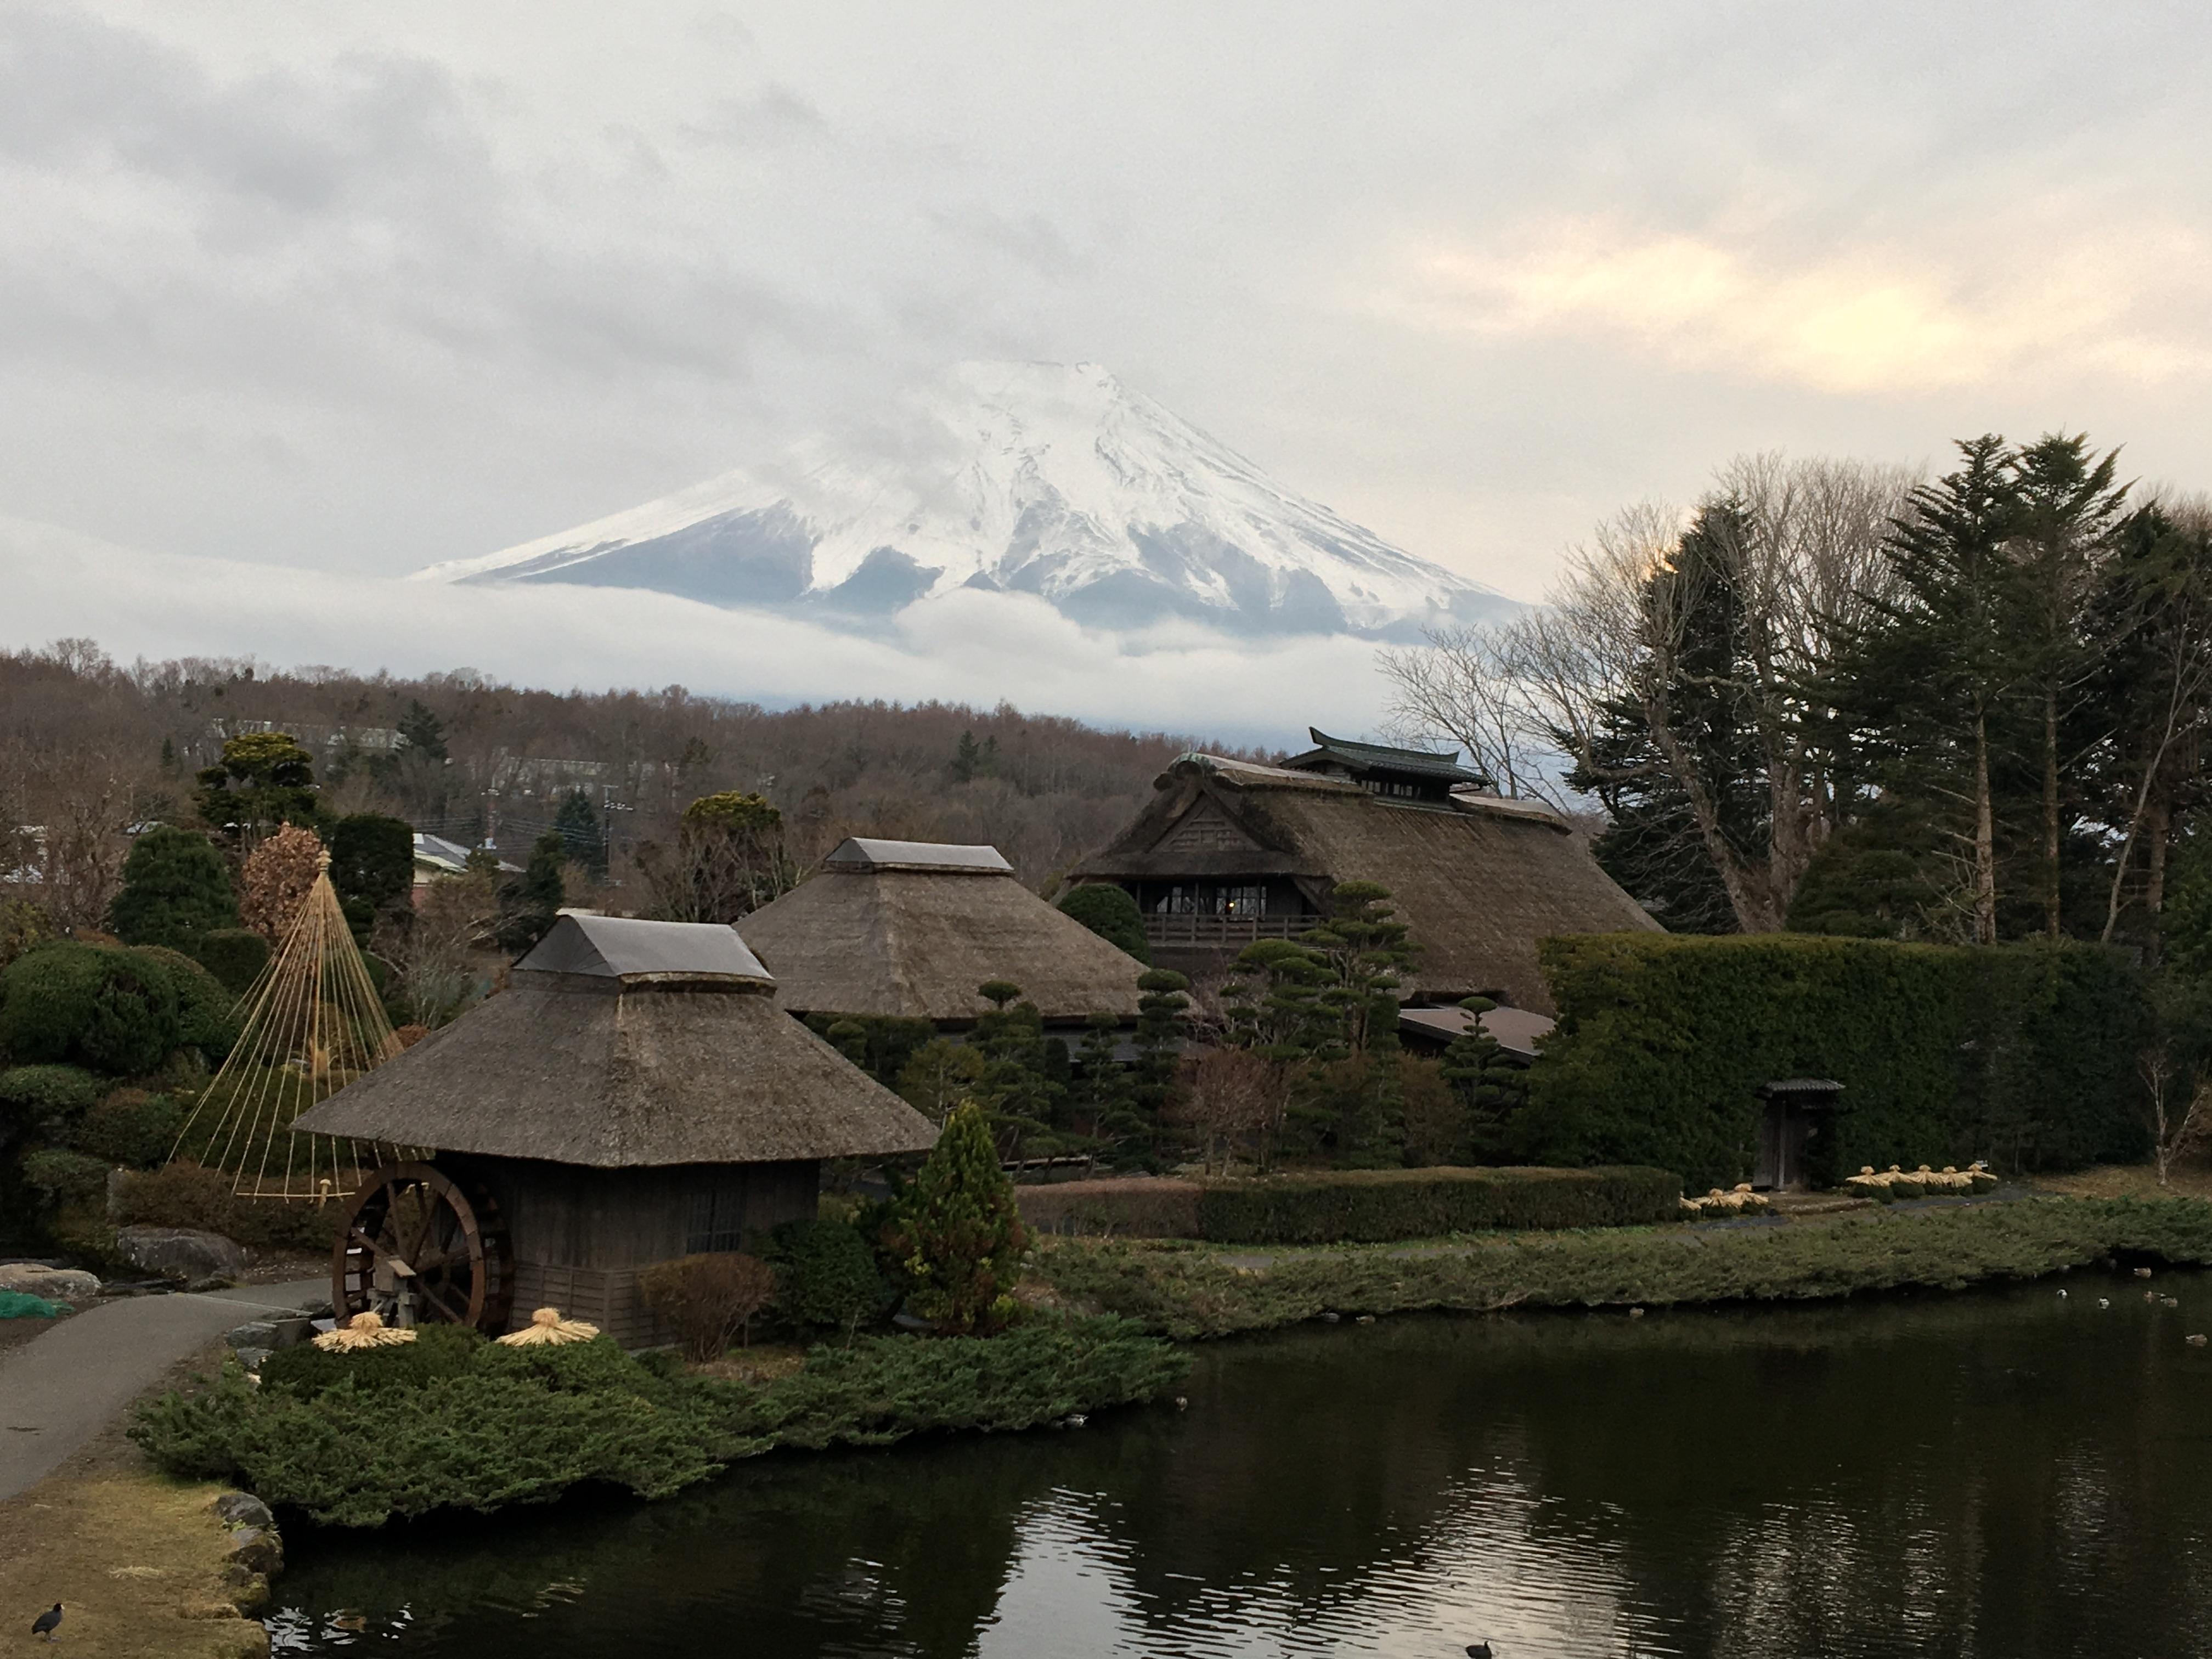 Mt. Fuji from Oshino Hakkai